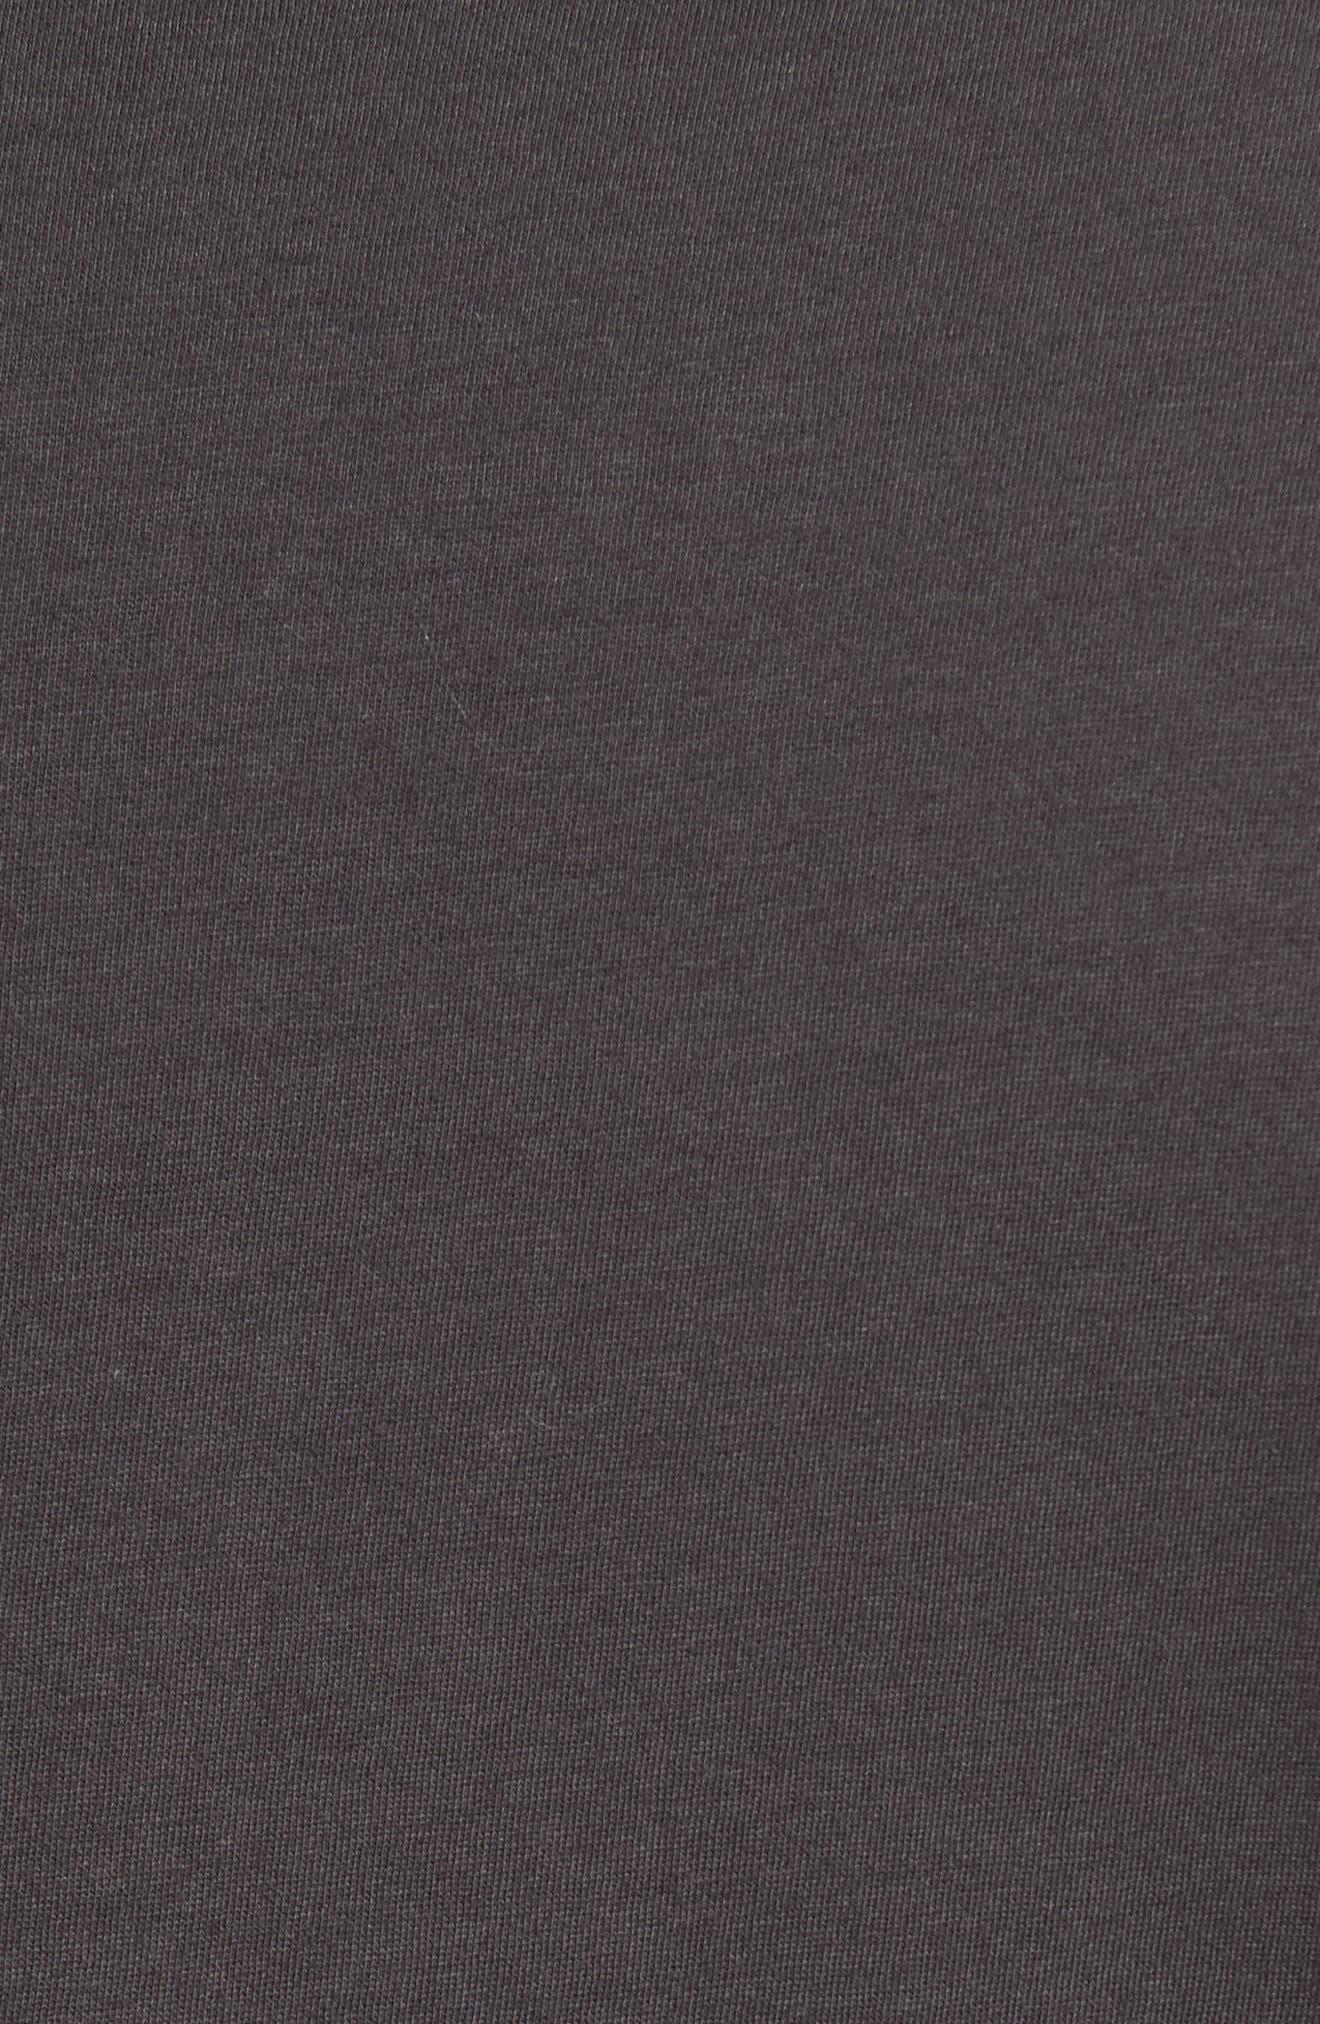 Long-Sleeve Henley T-Shirt,                             Alternate thumbnail 5, color,                             020